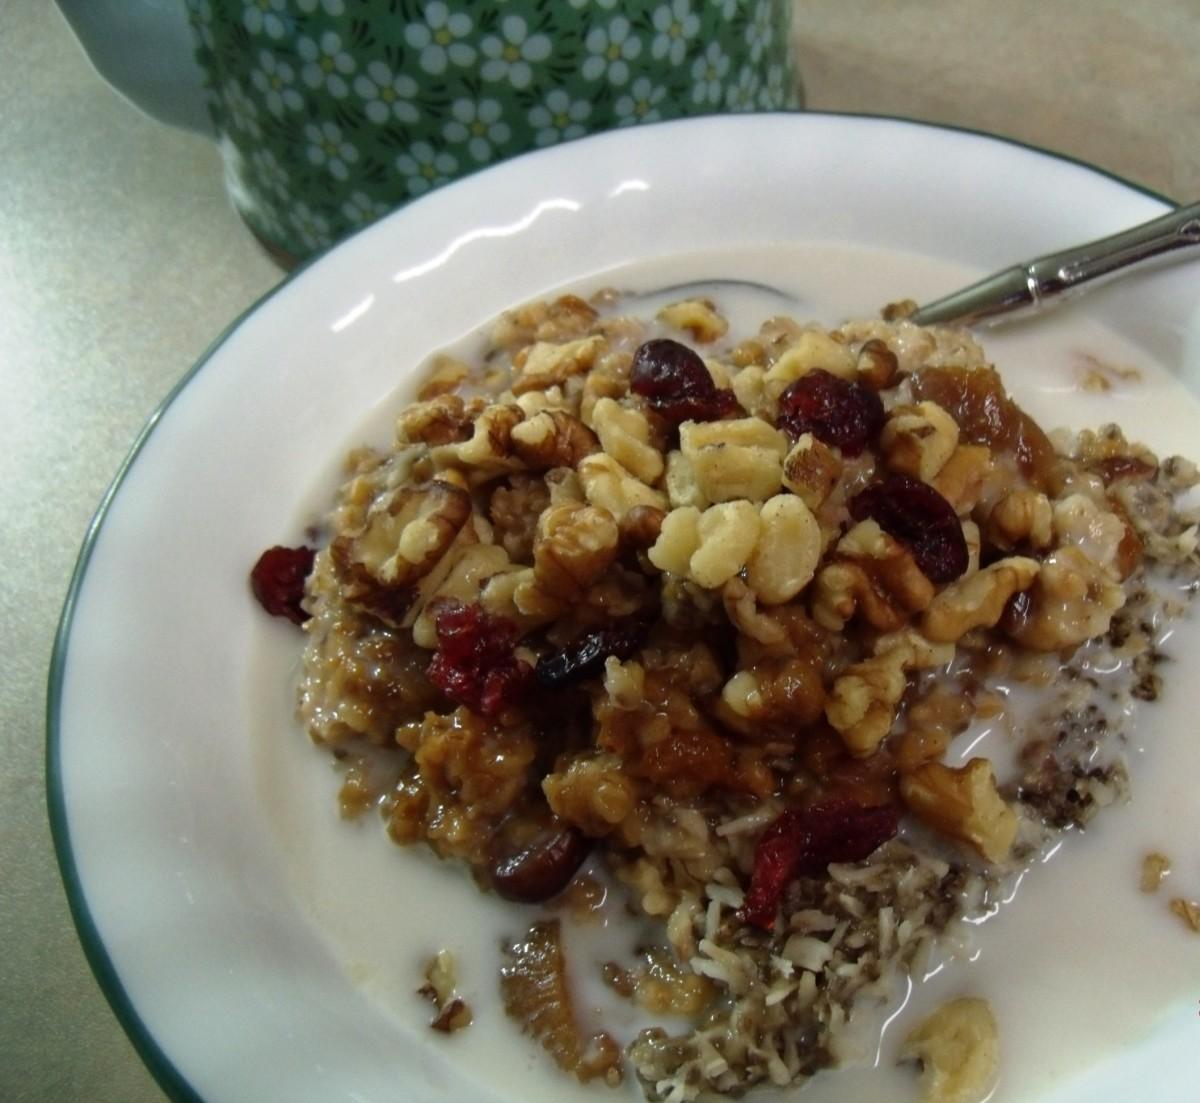 4 Super Nutritious Gluten-Free Slow-Cooker Porridge Recipes